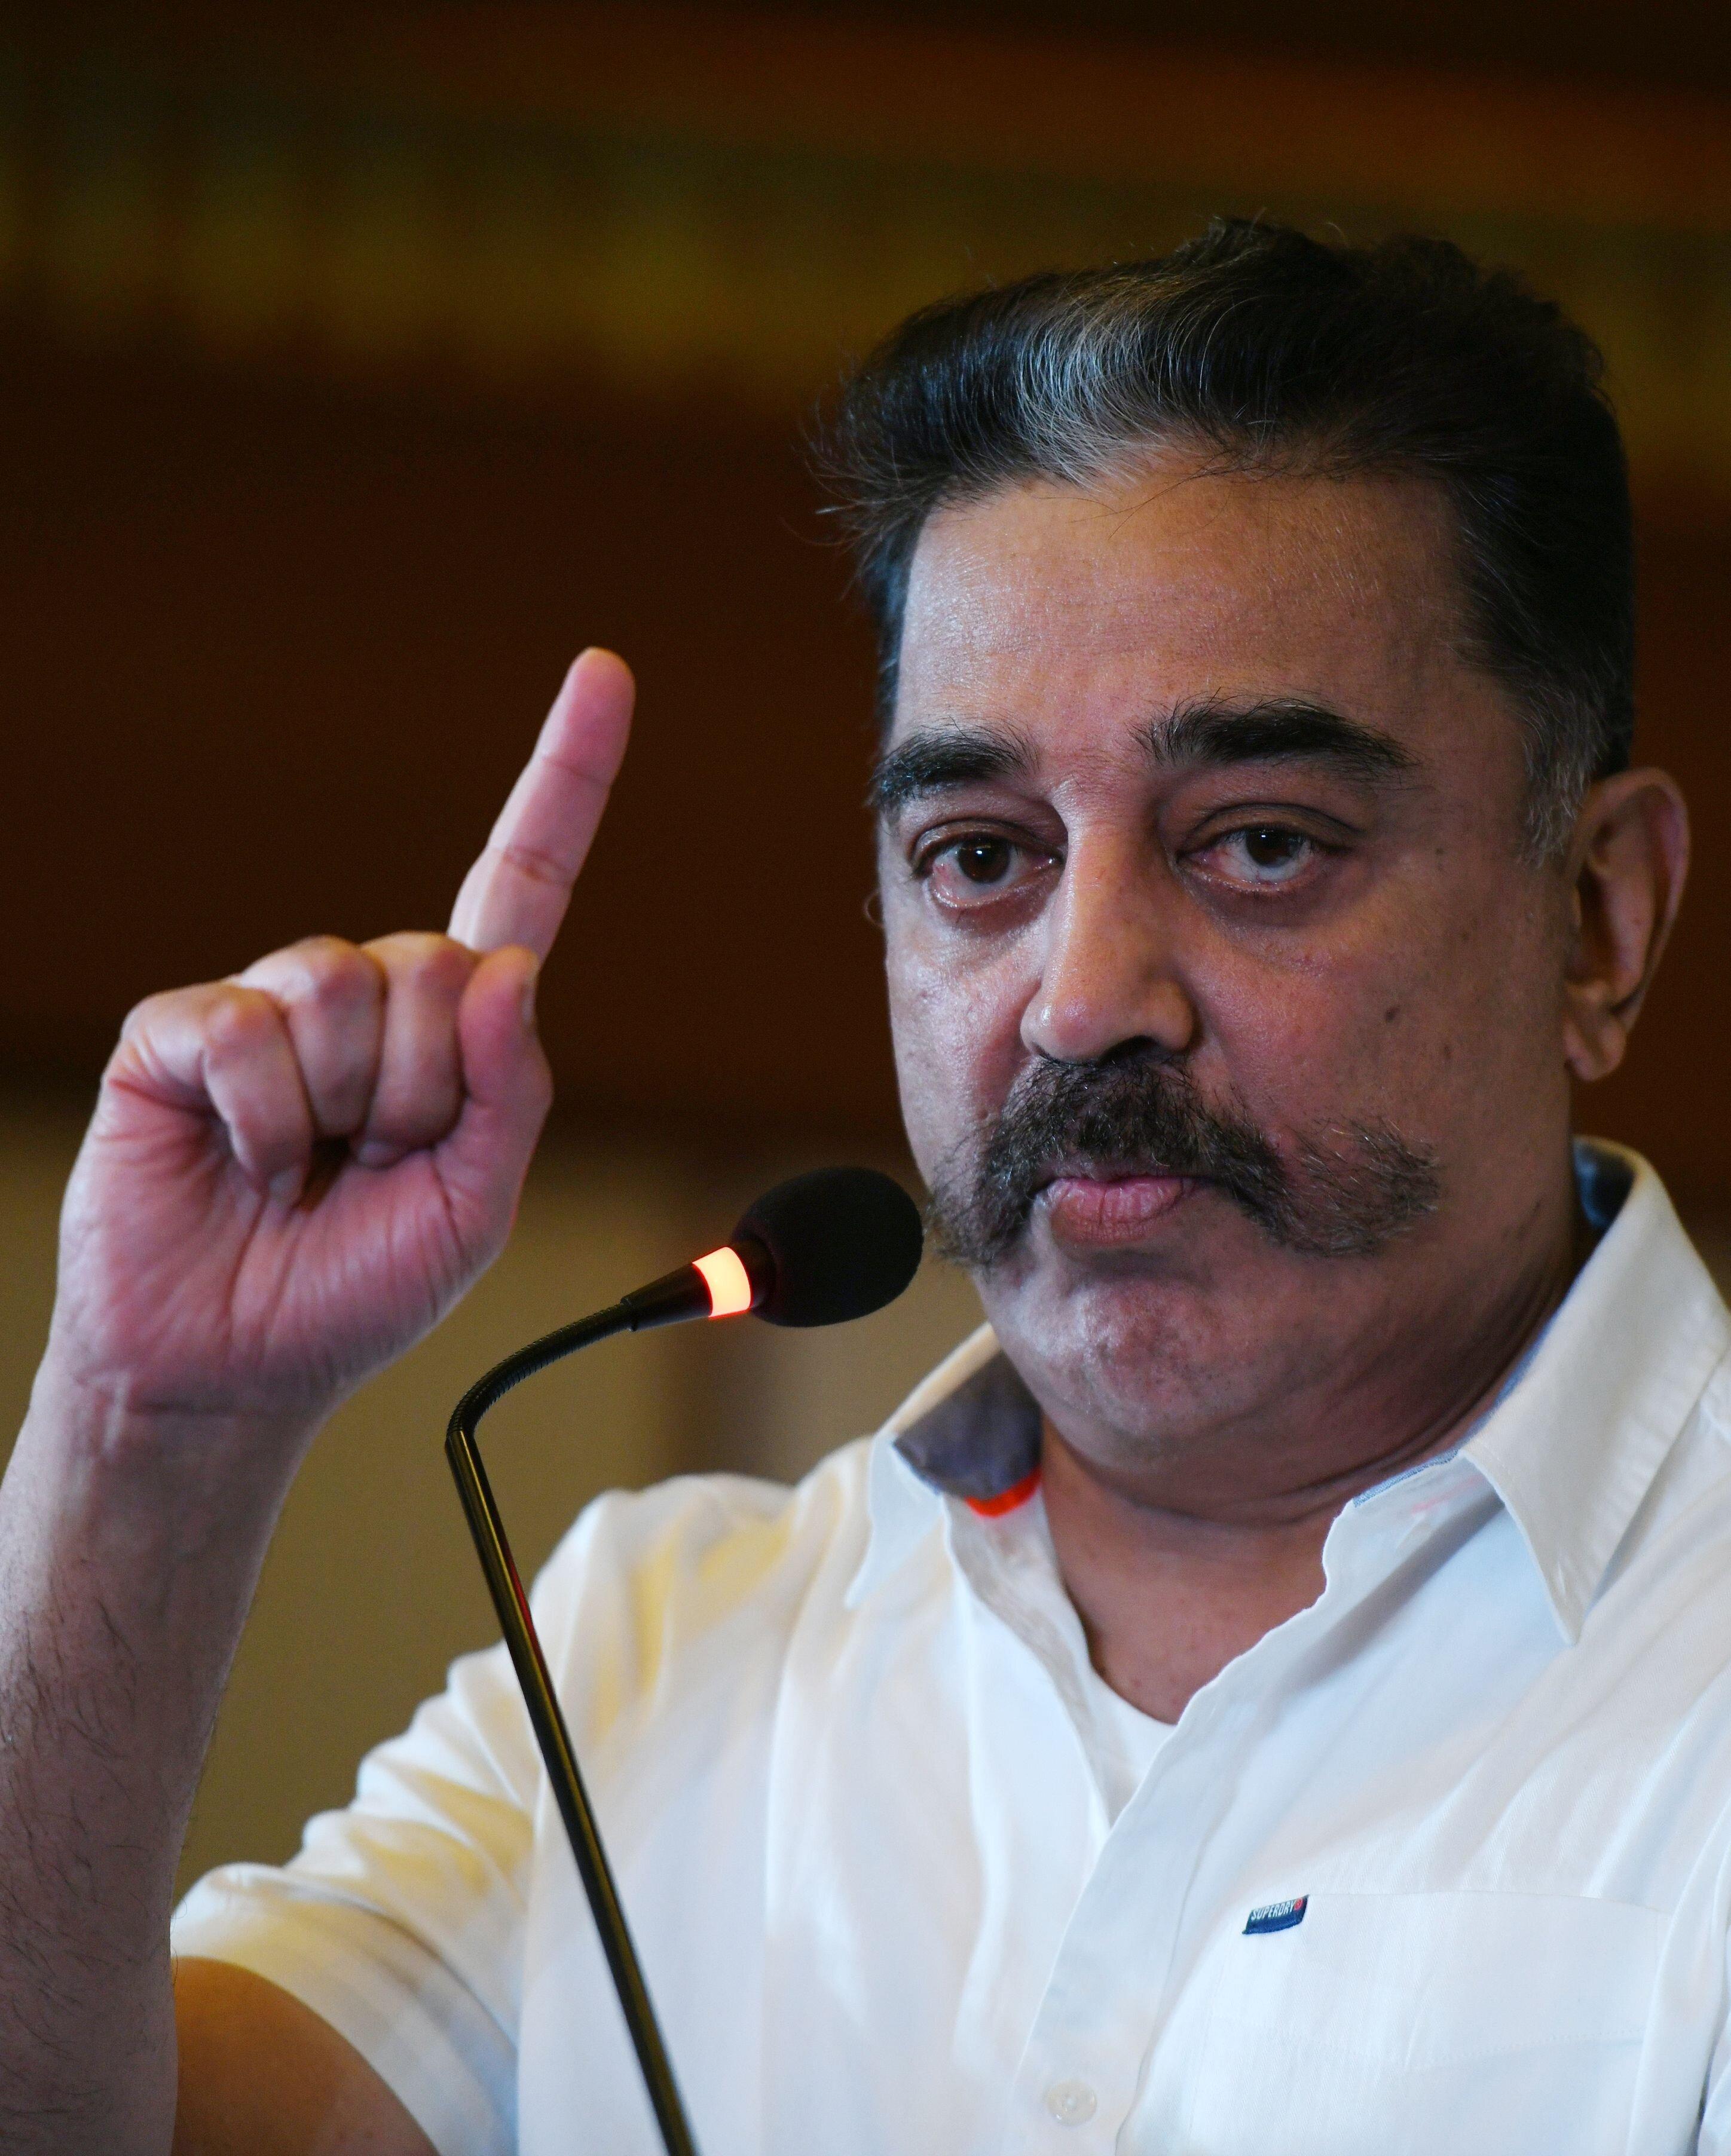 Only Spoke The 'Historic Truth': Kamal Haasan On His Nathuram Godse